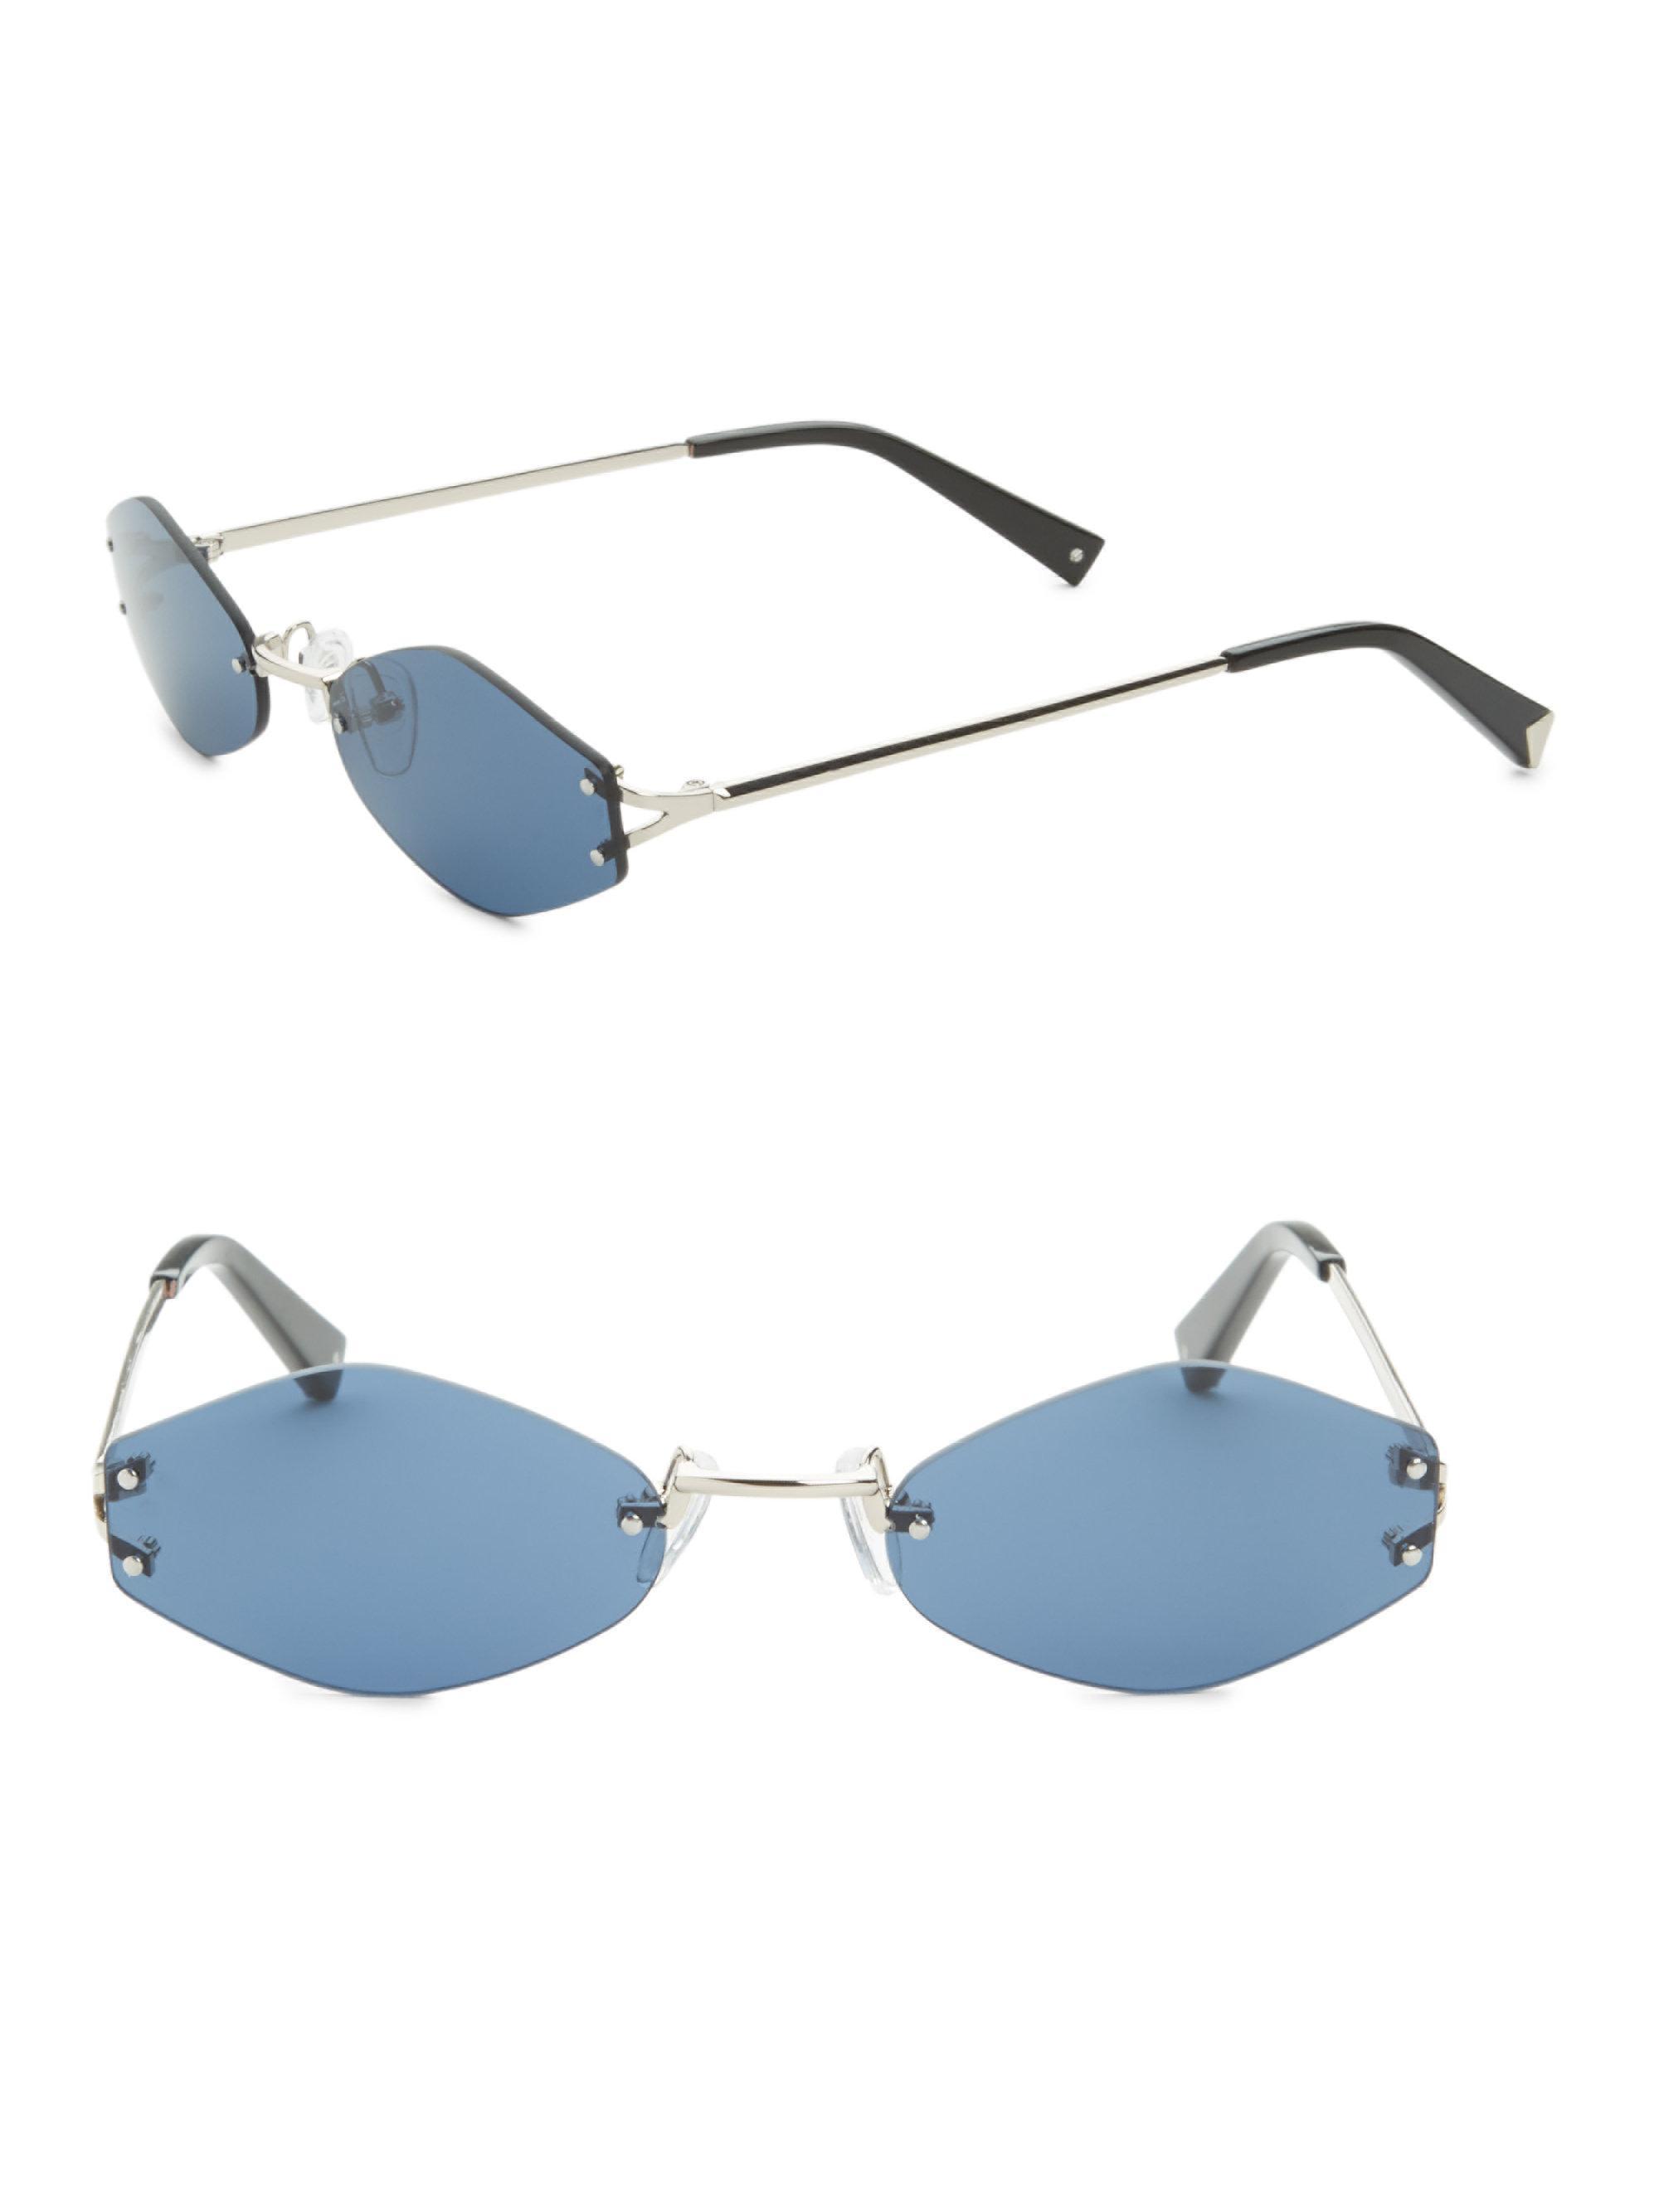 68663f3bfd Lyst - Kendall + Kylie 51mm Geometric Sunglasses in Metallic